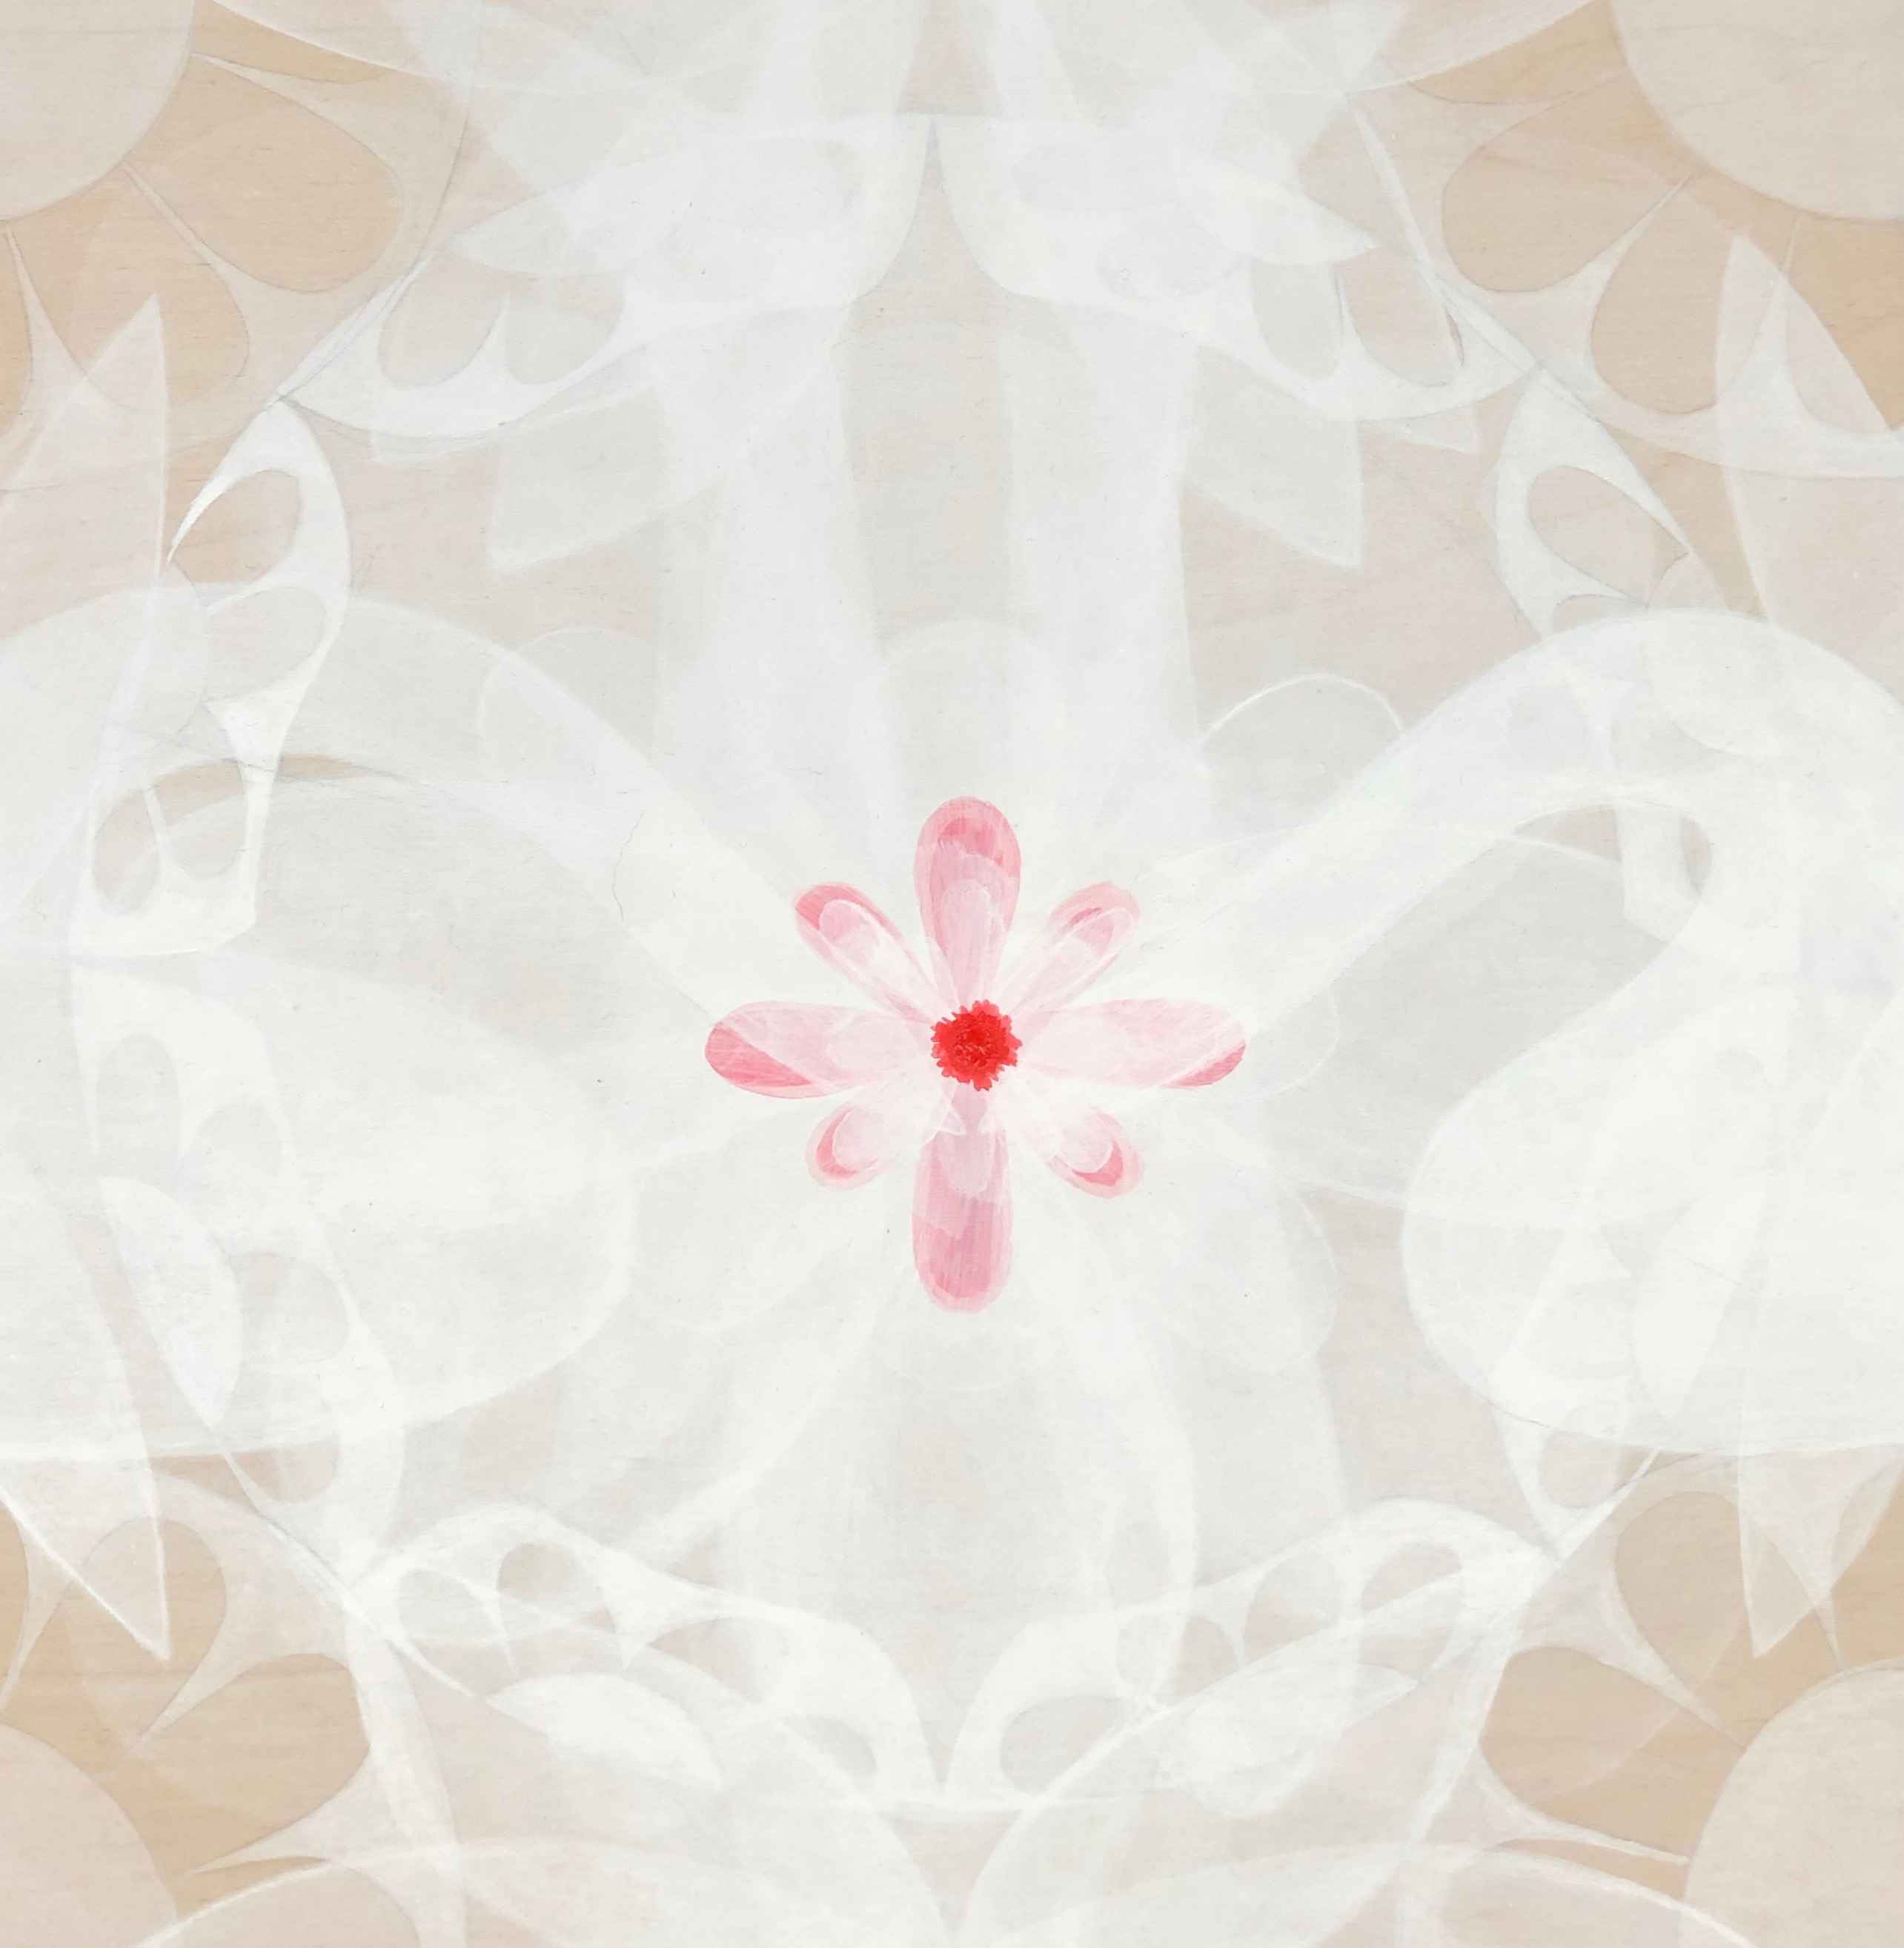 The Trick by  Julianne Martin - Masterpiece Online